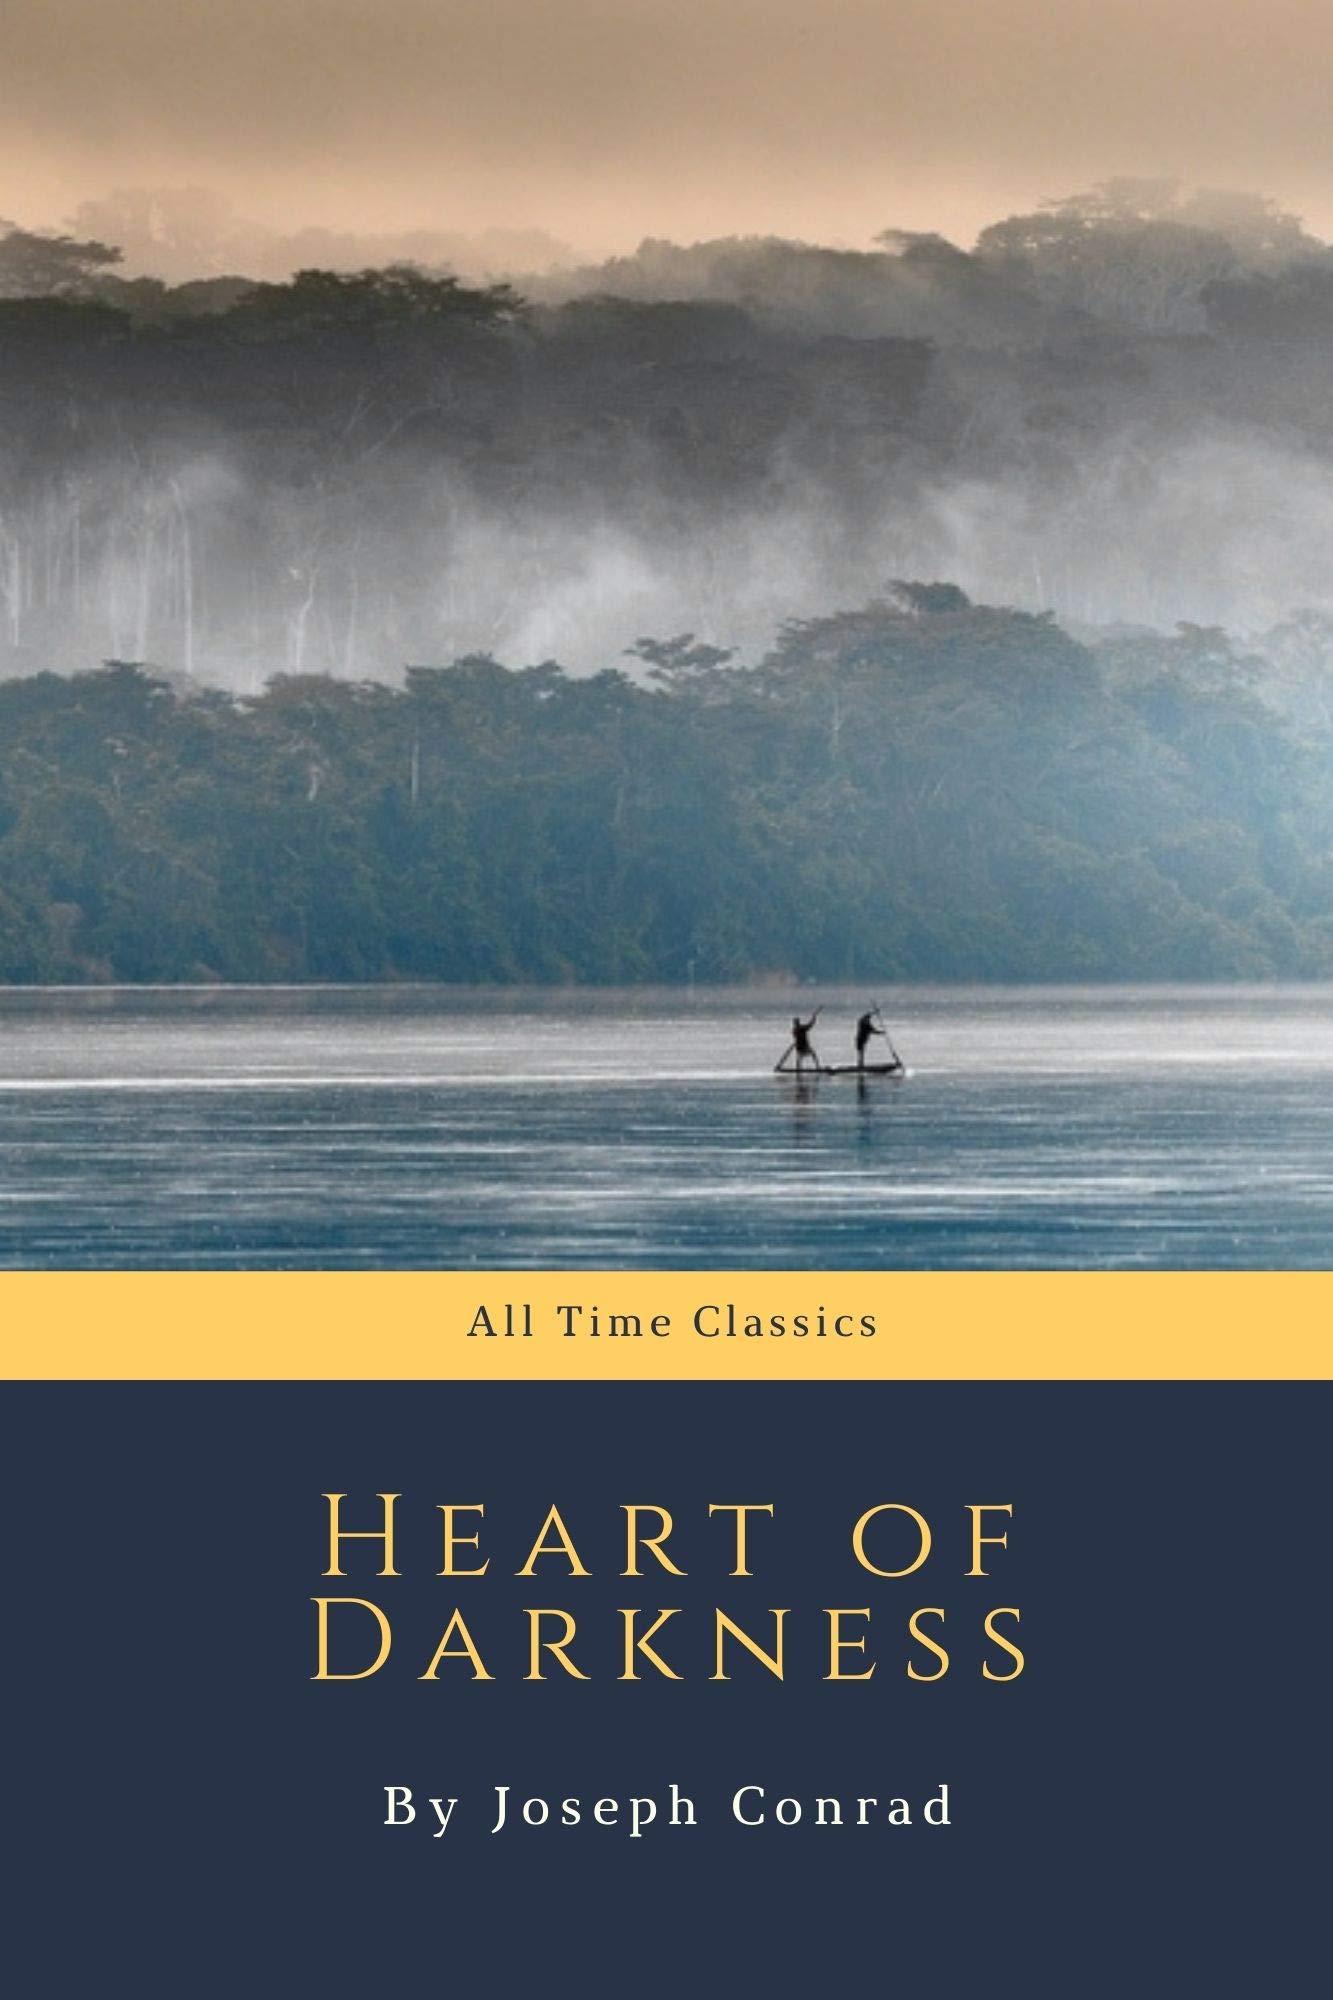 Heart of Darkness by Joseph Conrad (All Time Classics Book 27)